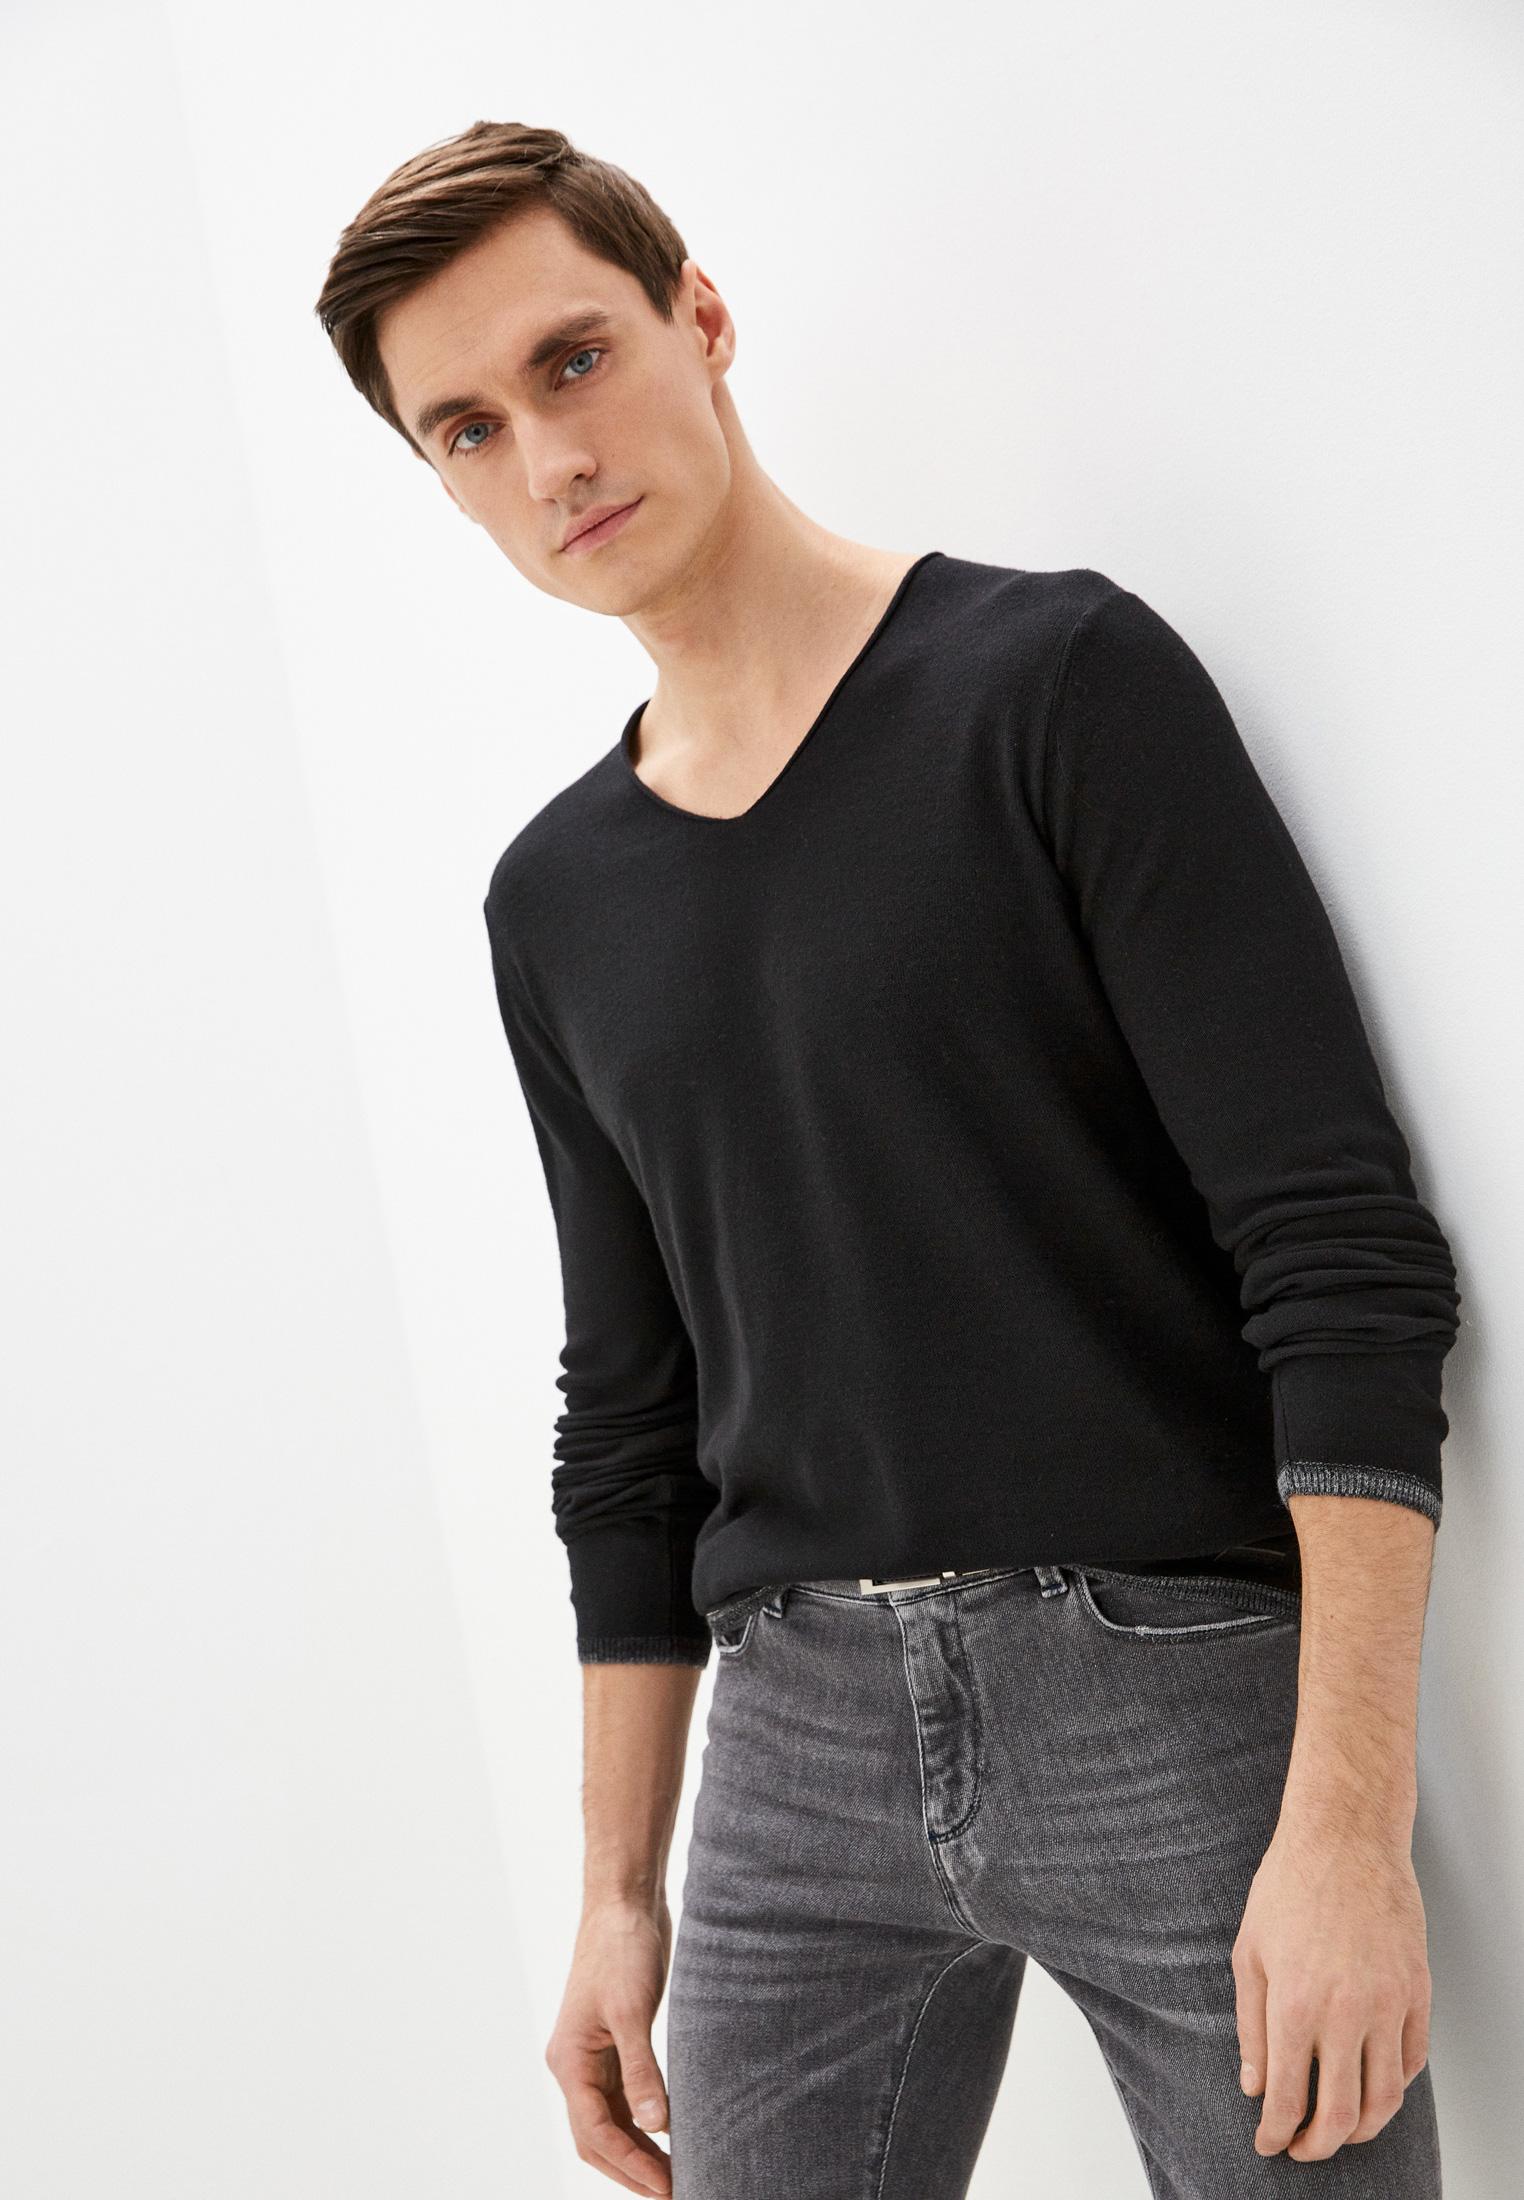 Пуловер TRUSSARDI JEANS (Труссарди Джинс) Пуловер Trussardi Jeans